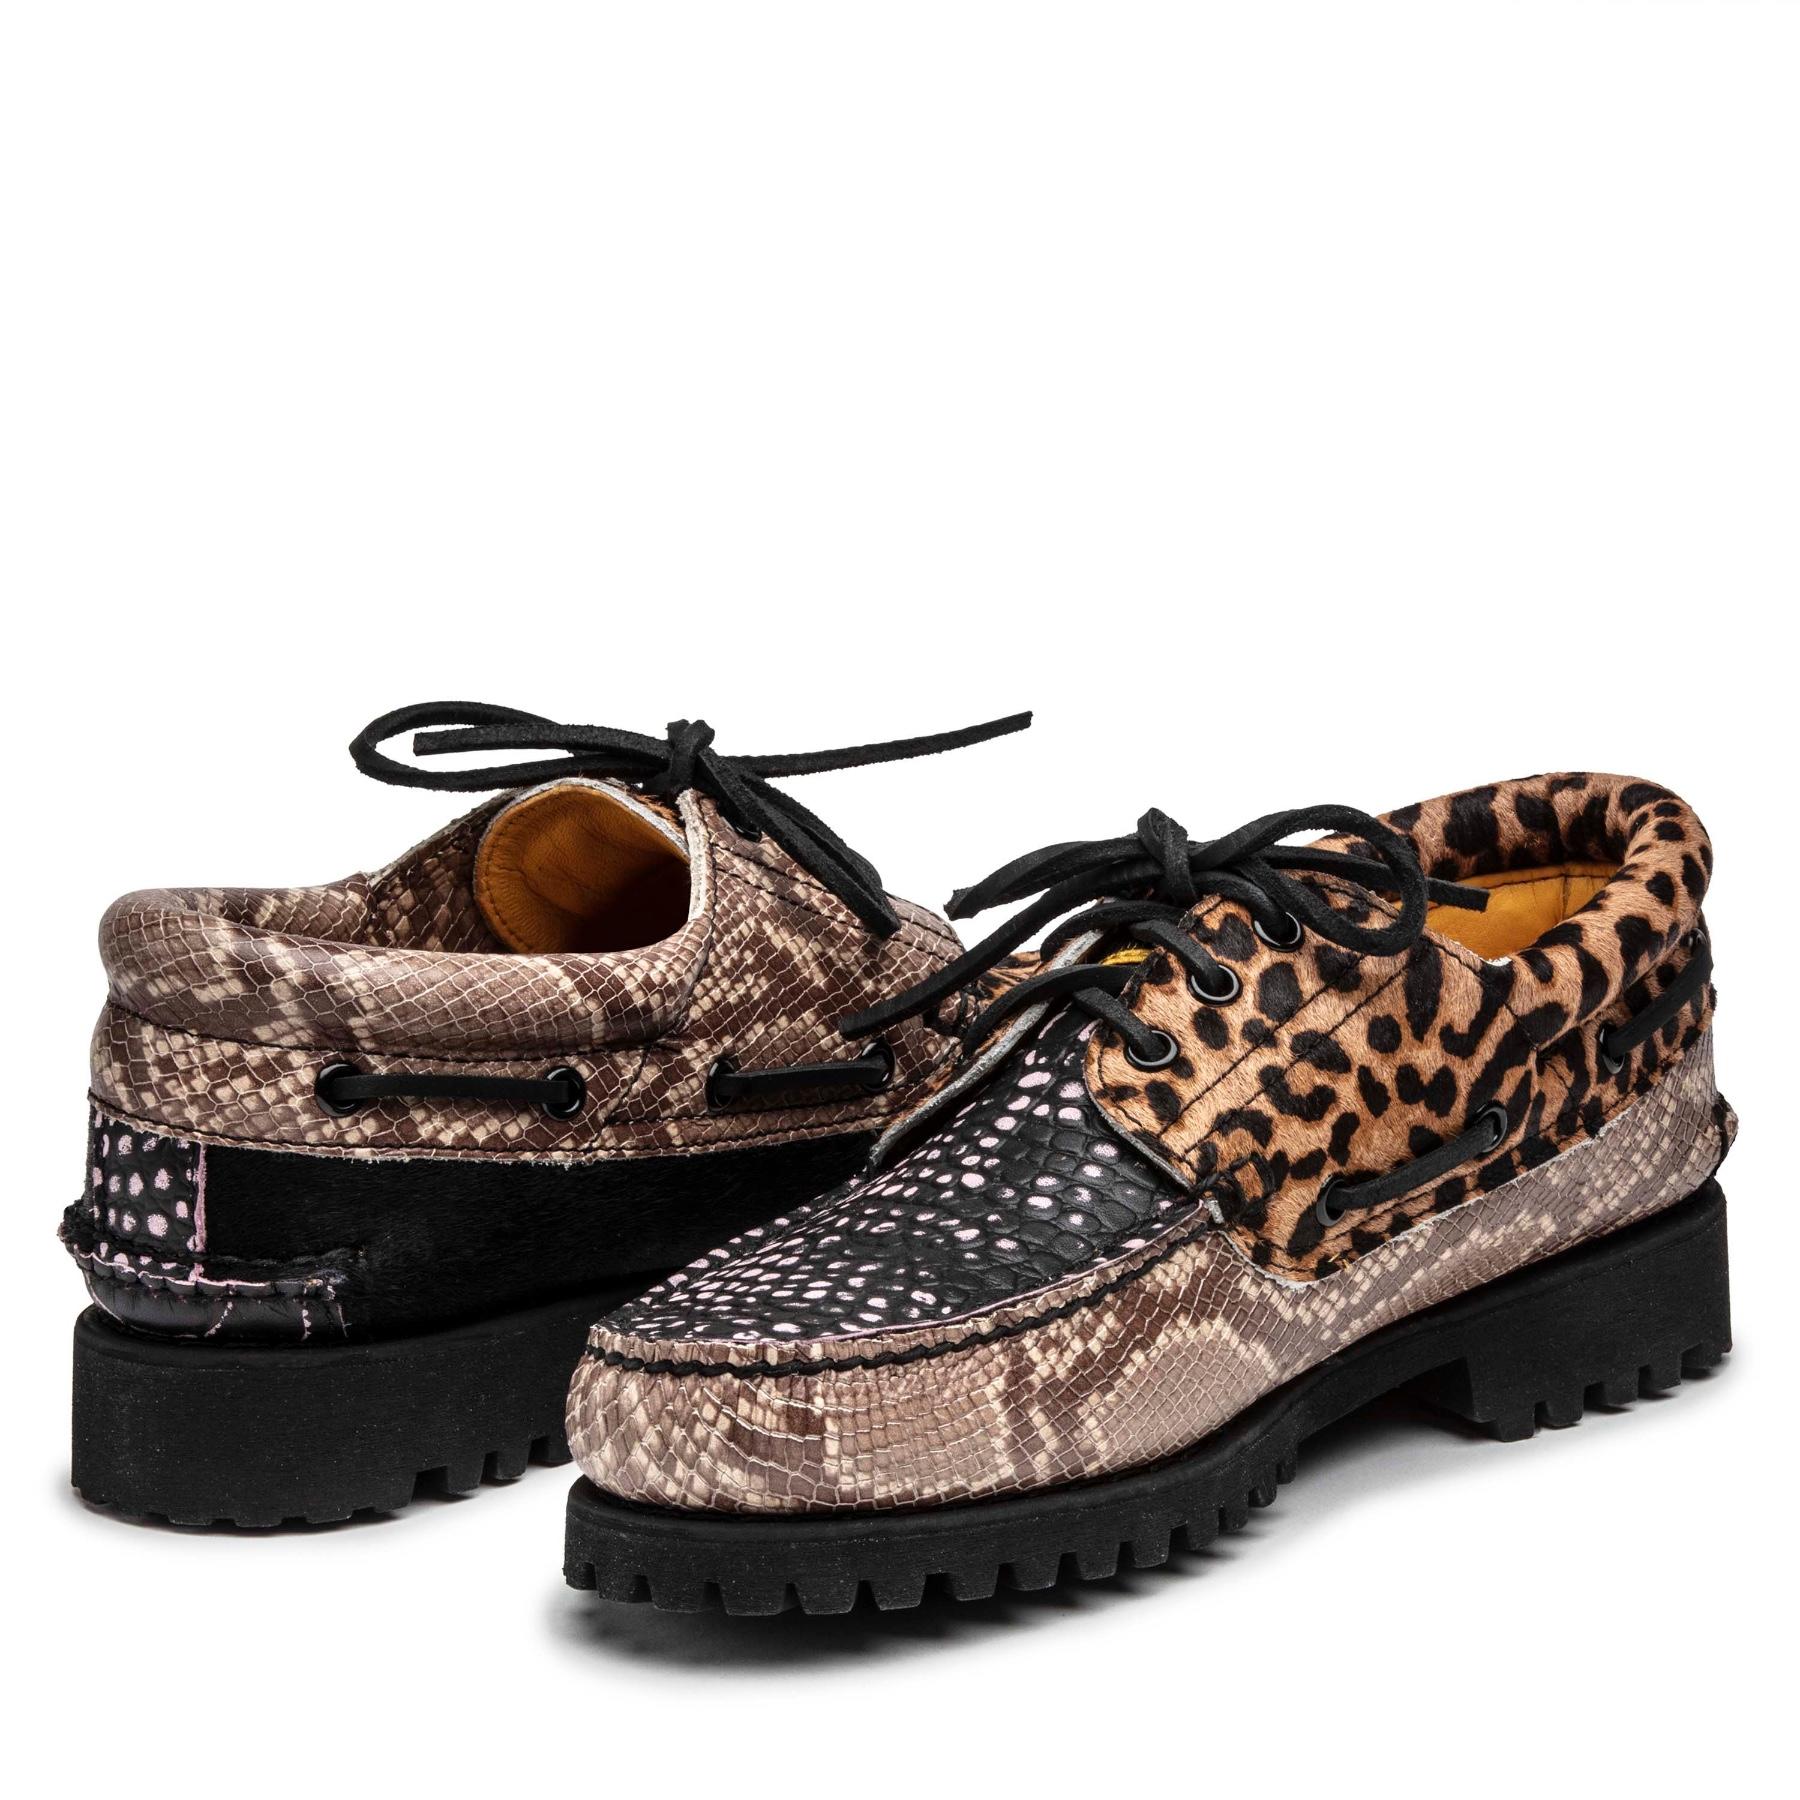 Chinatown Market x Timberland 2020 scarpa da barca